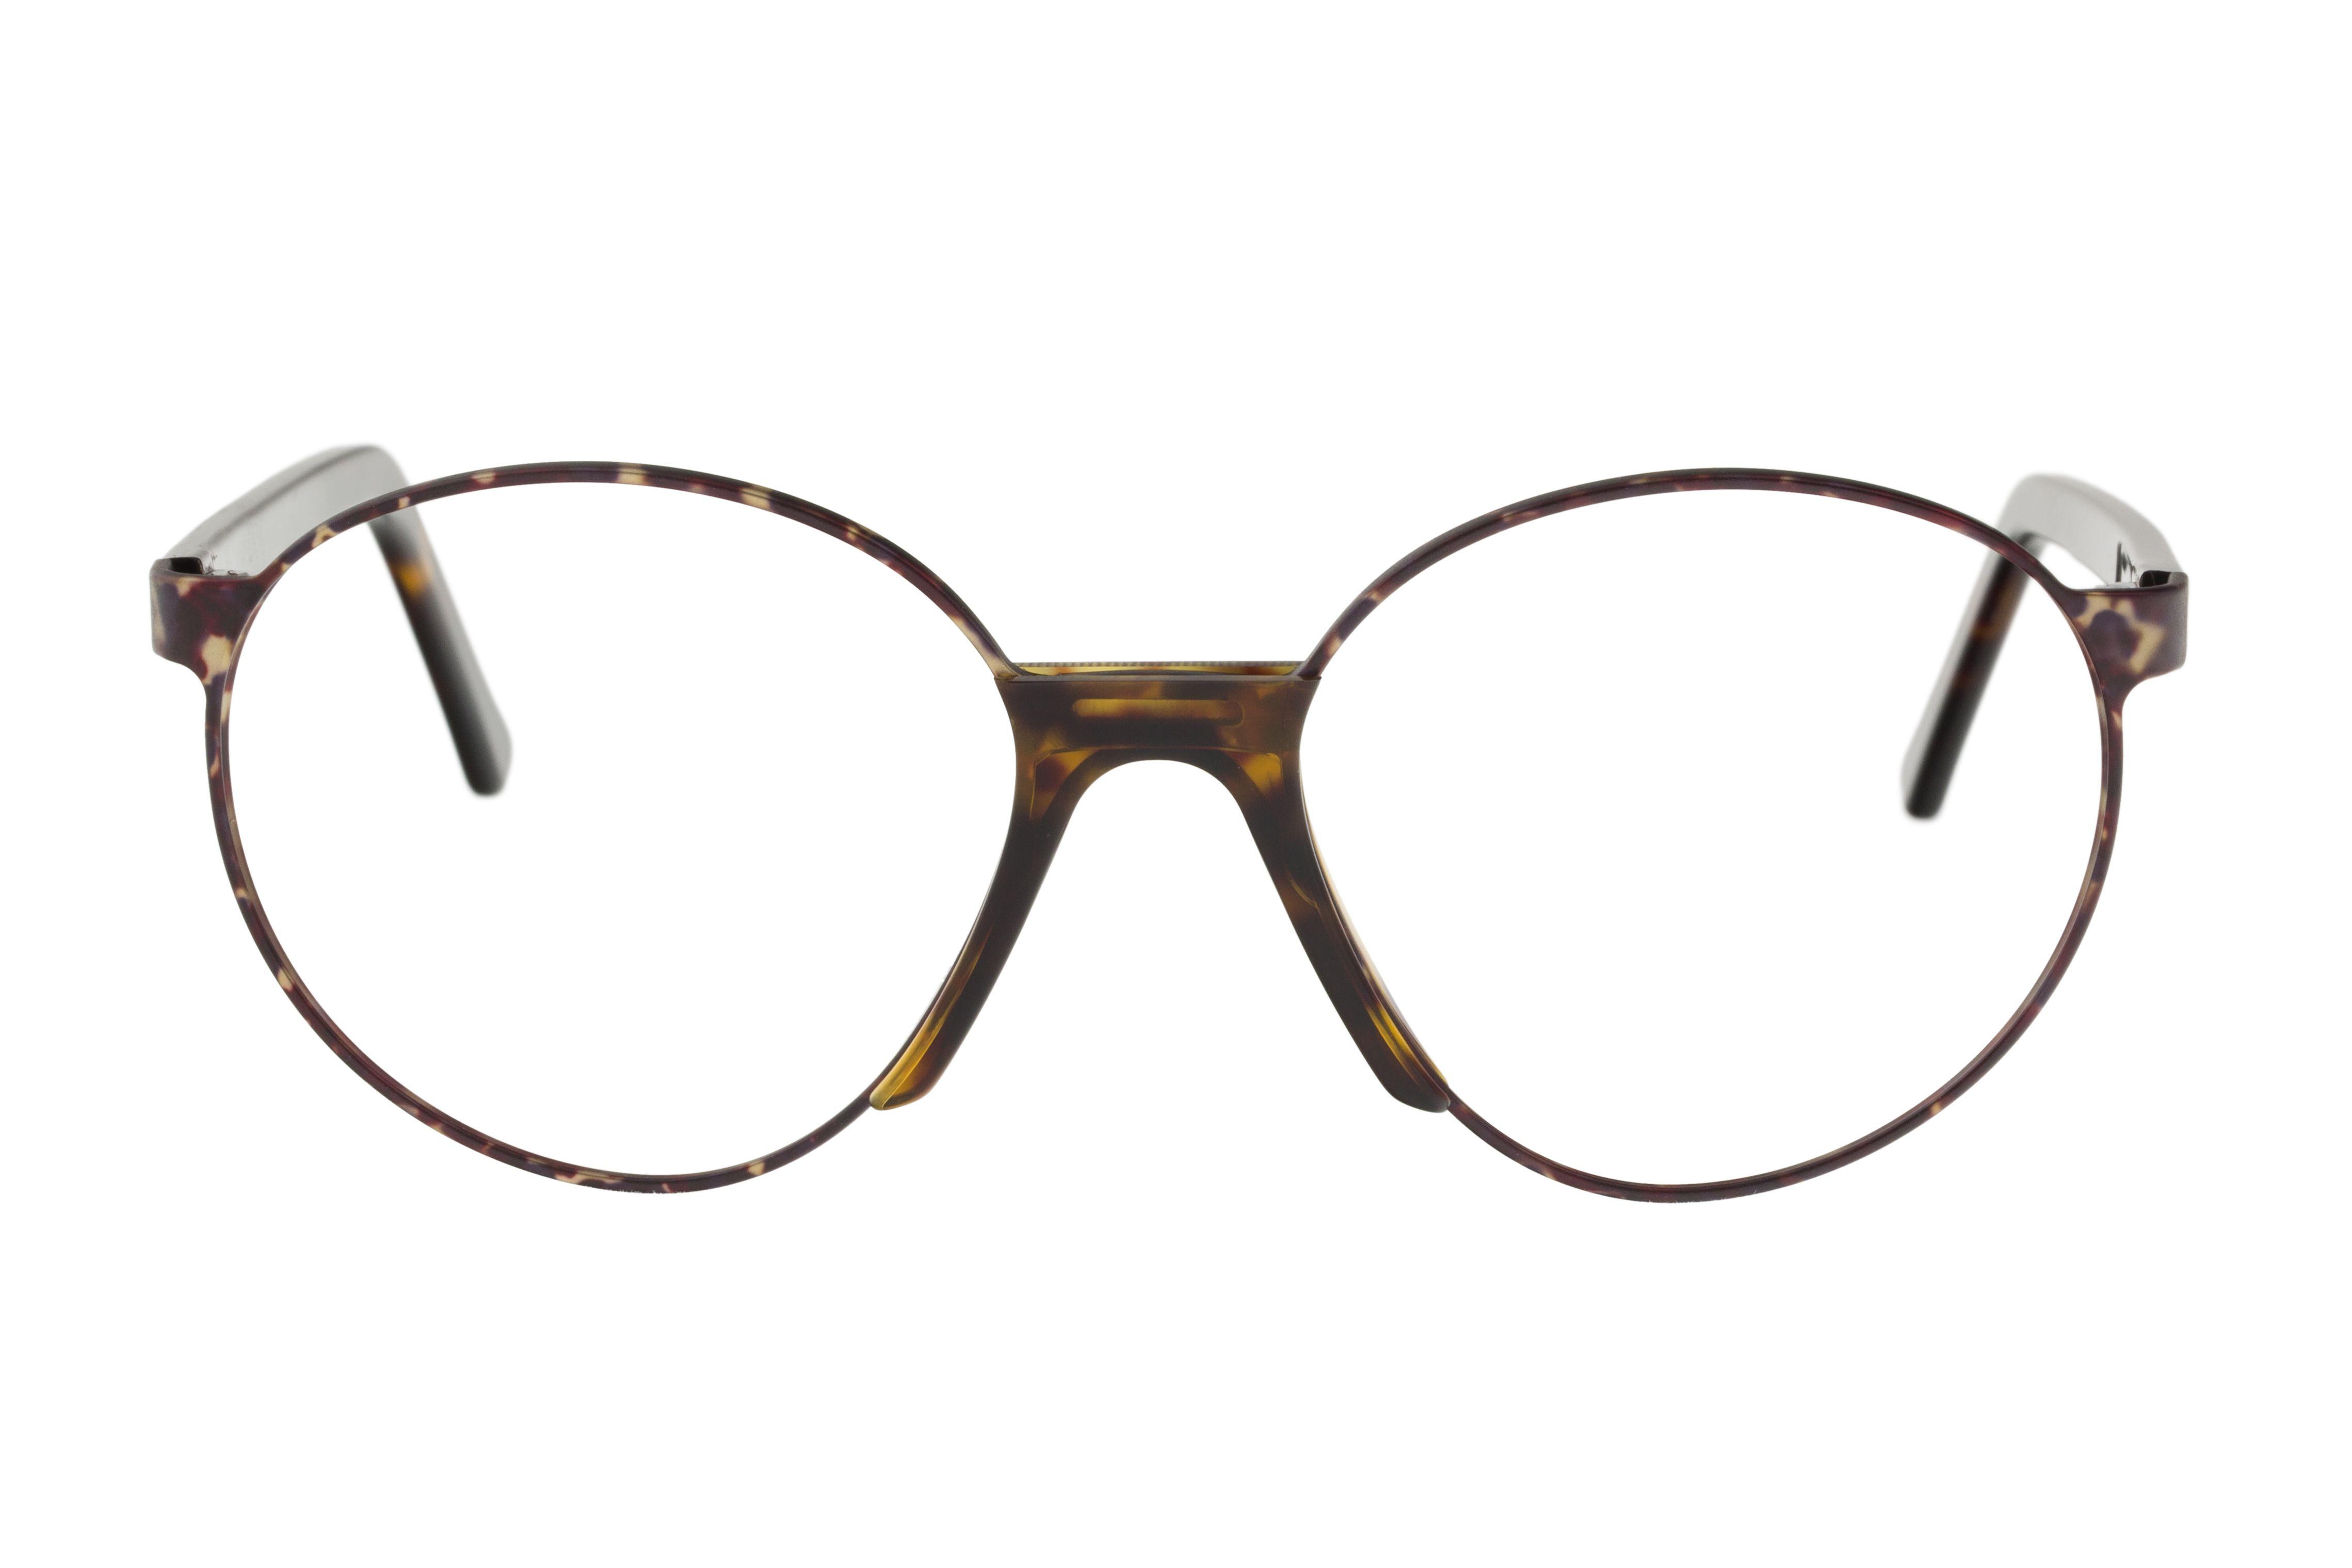 ANDY WOLF - Pevsner col. d - White Heat - Glasses - Eyewear